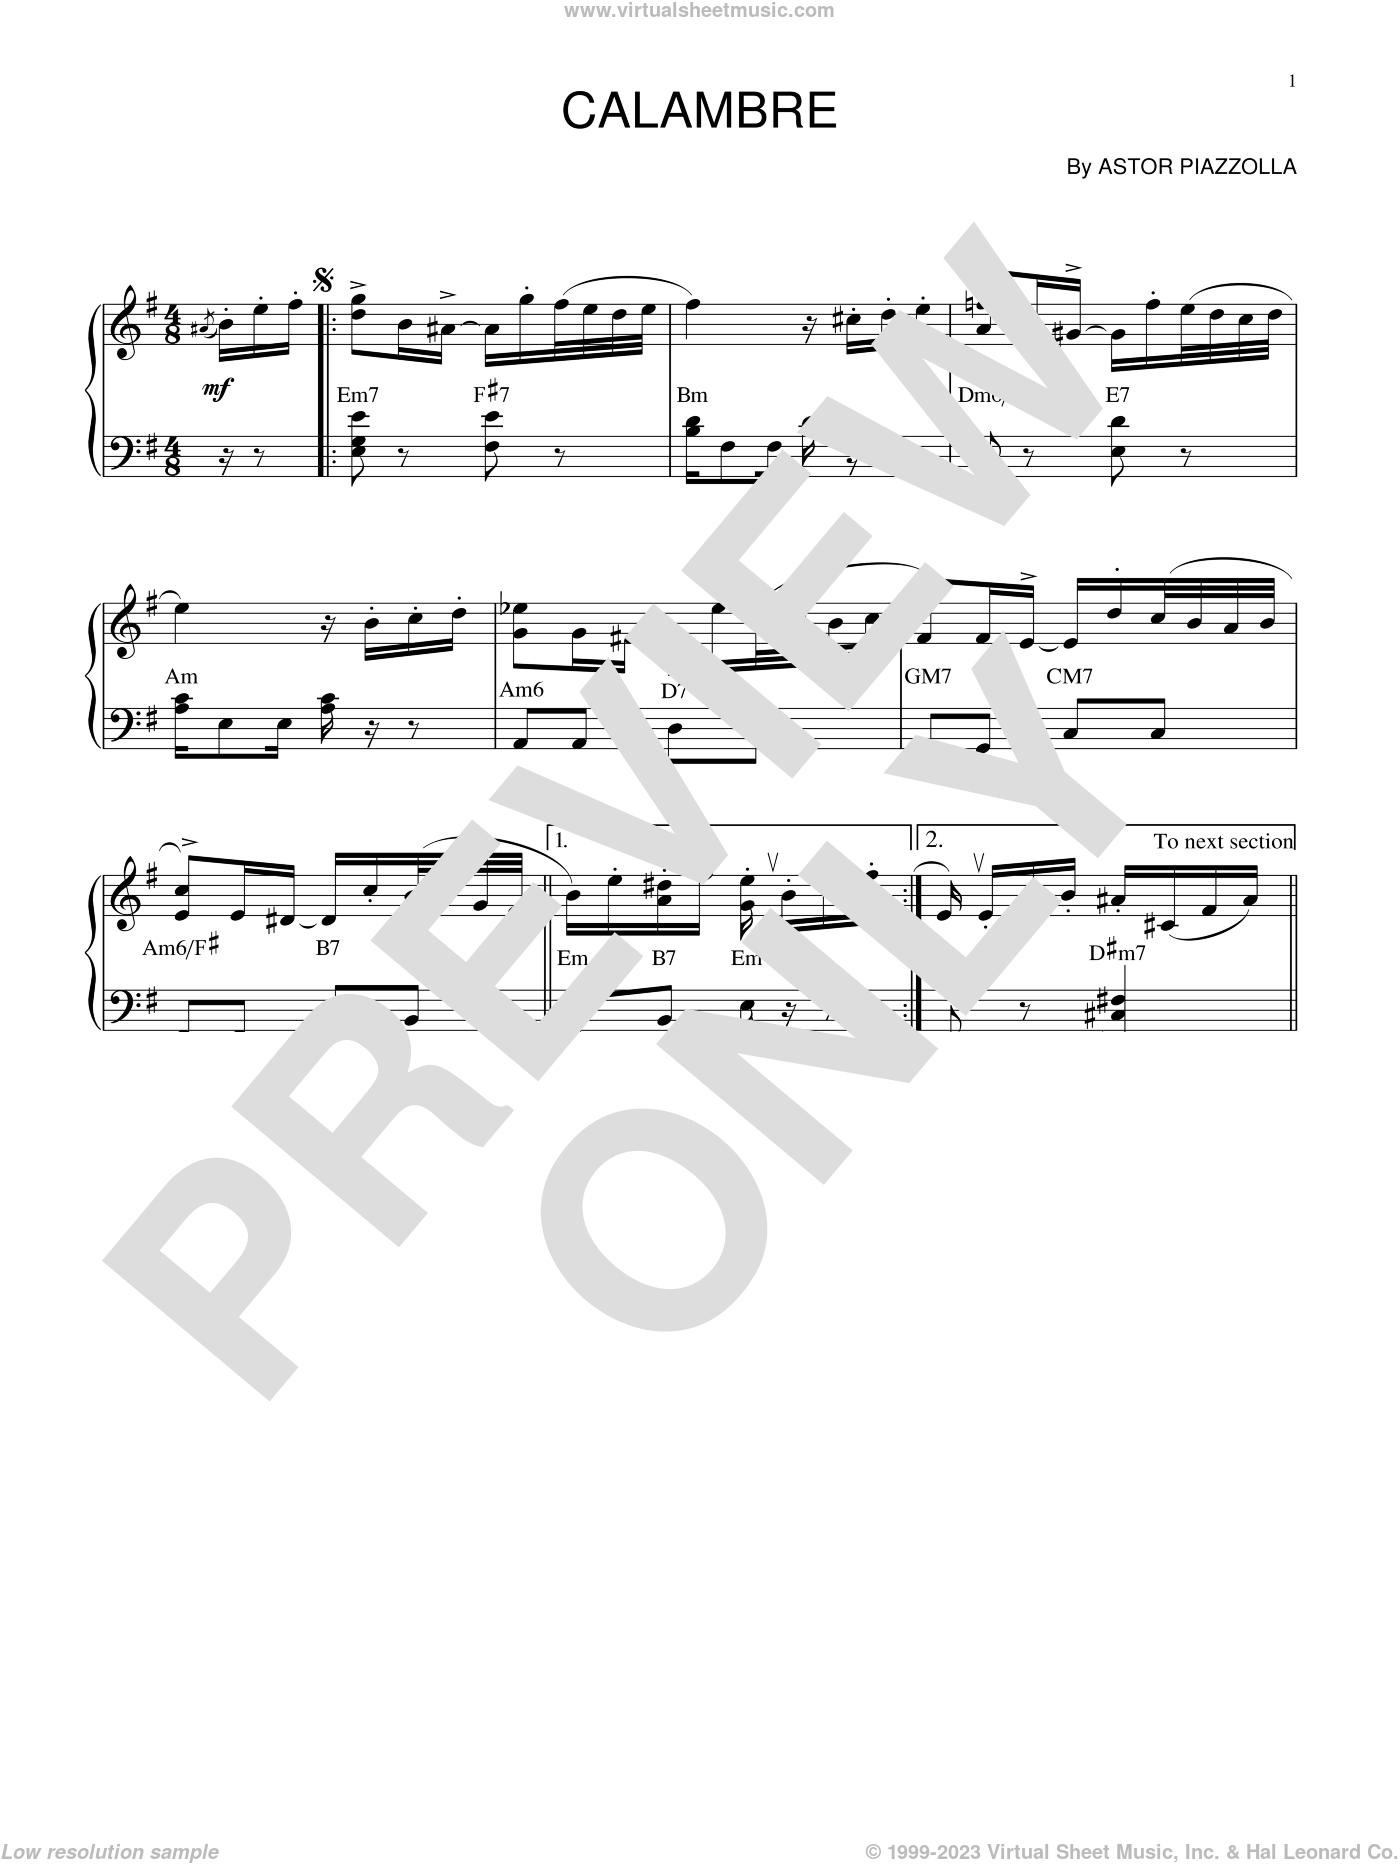 Calambre sheet music for piano solo by Astor Piazzolla, intermediate skill level